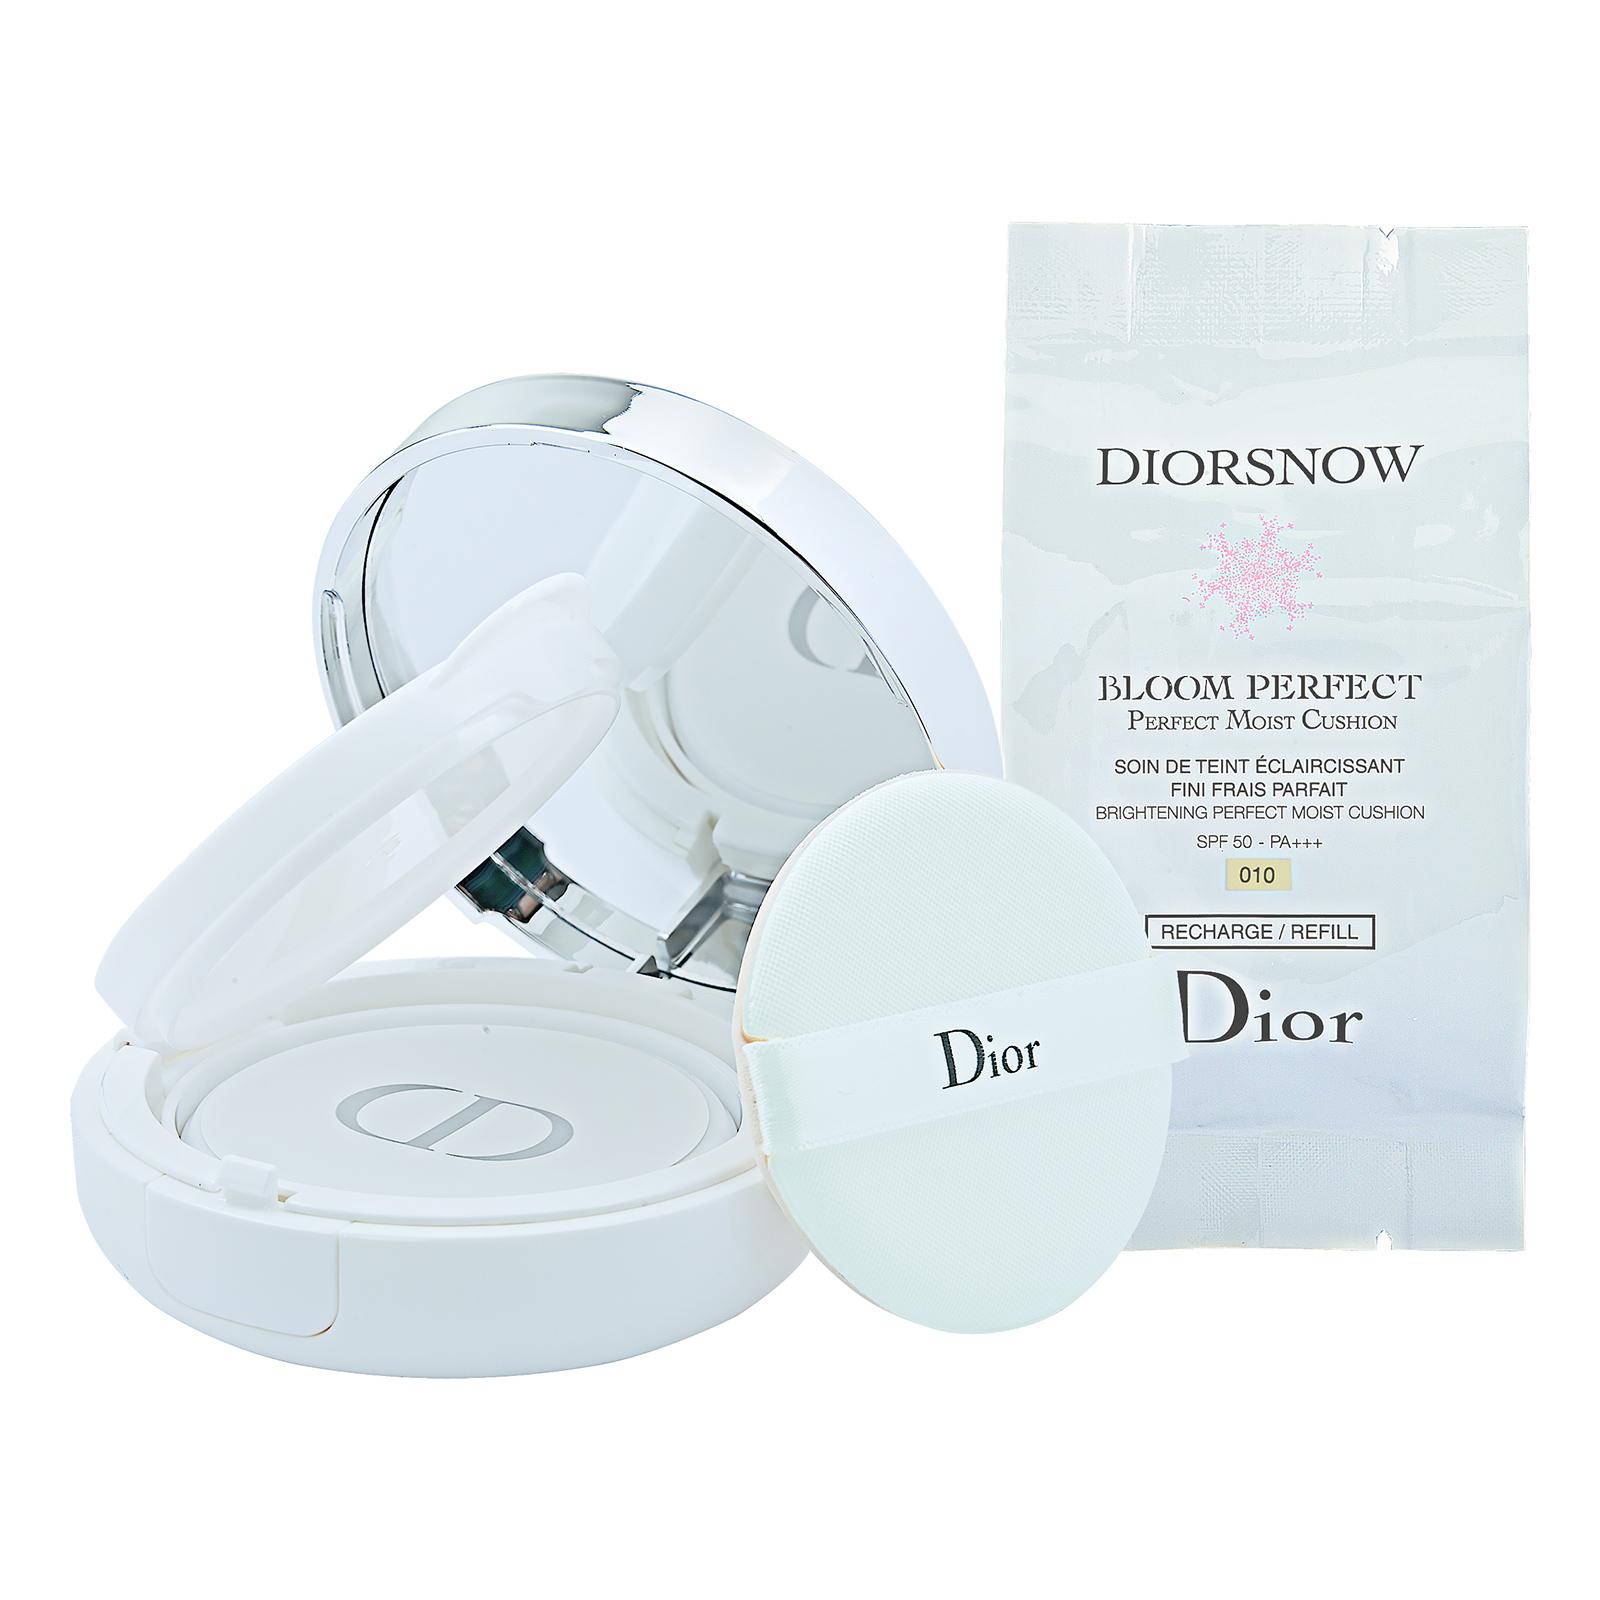 Christian Dior DiorSnow Bloom Perfect Brightening Perfect Moist Cushion SPF50- PA+++ 010, 2 x 15 g,